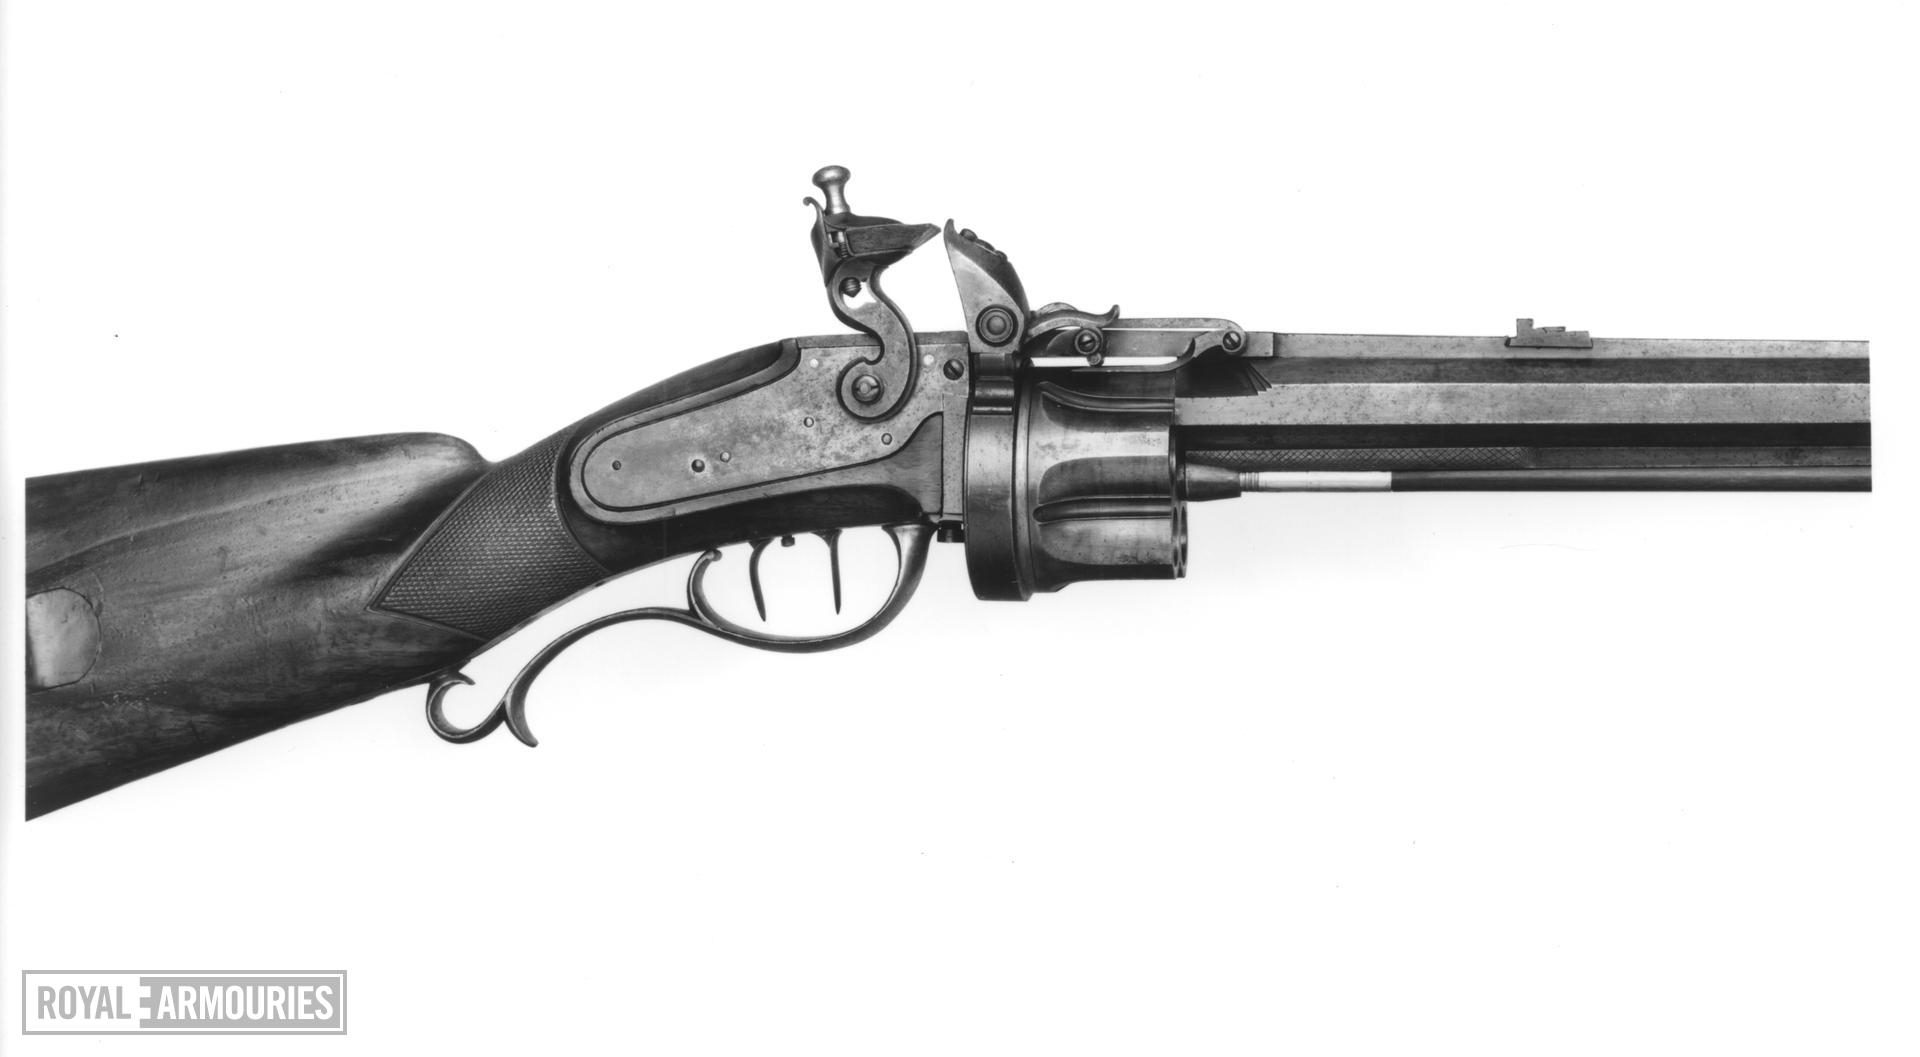 Flintlock revolver rifle - Kolb rifle